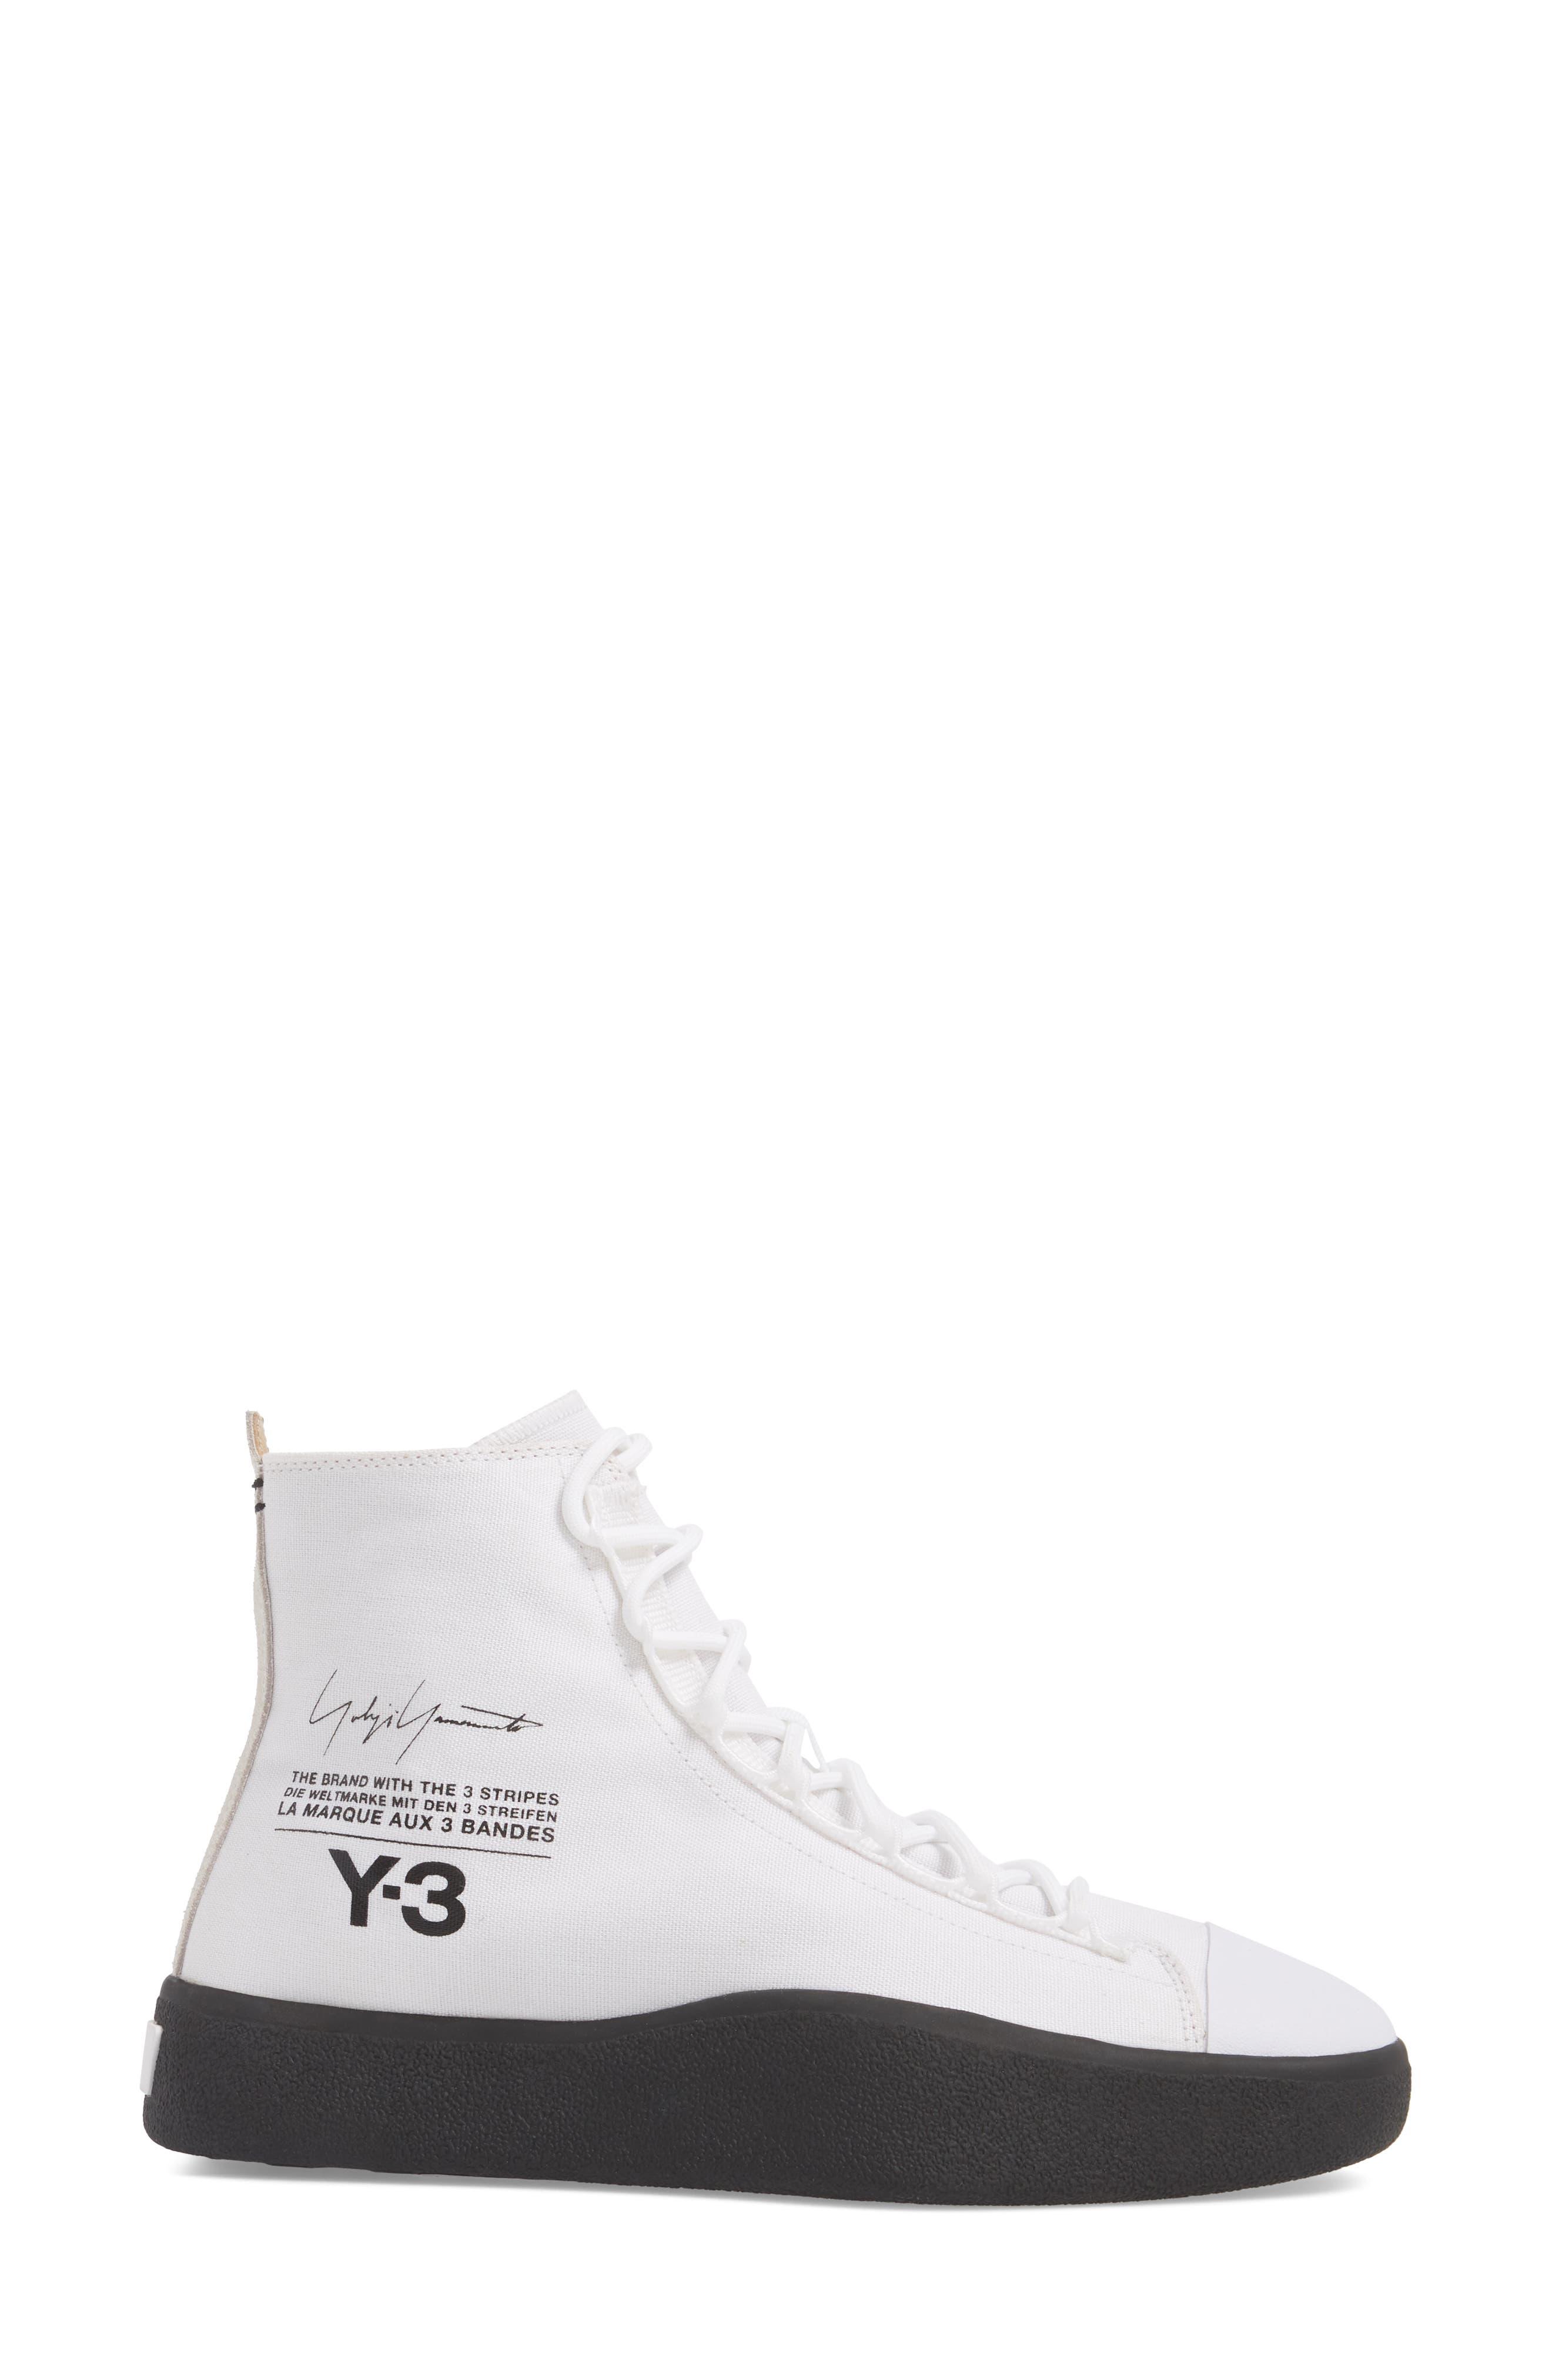 Bashyo High Top Sneaker,                             Alternate thumbnail 3, color,                             White/ Black